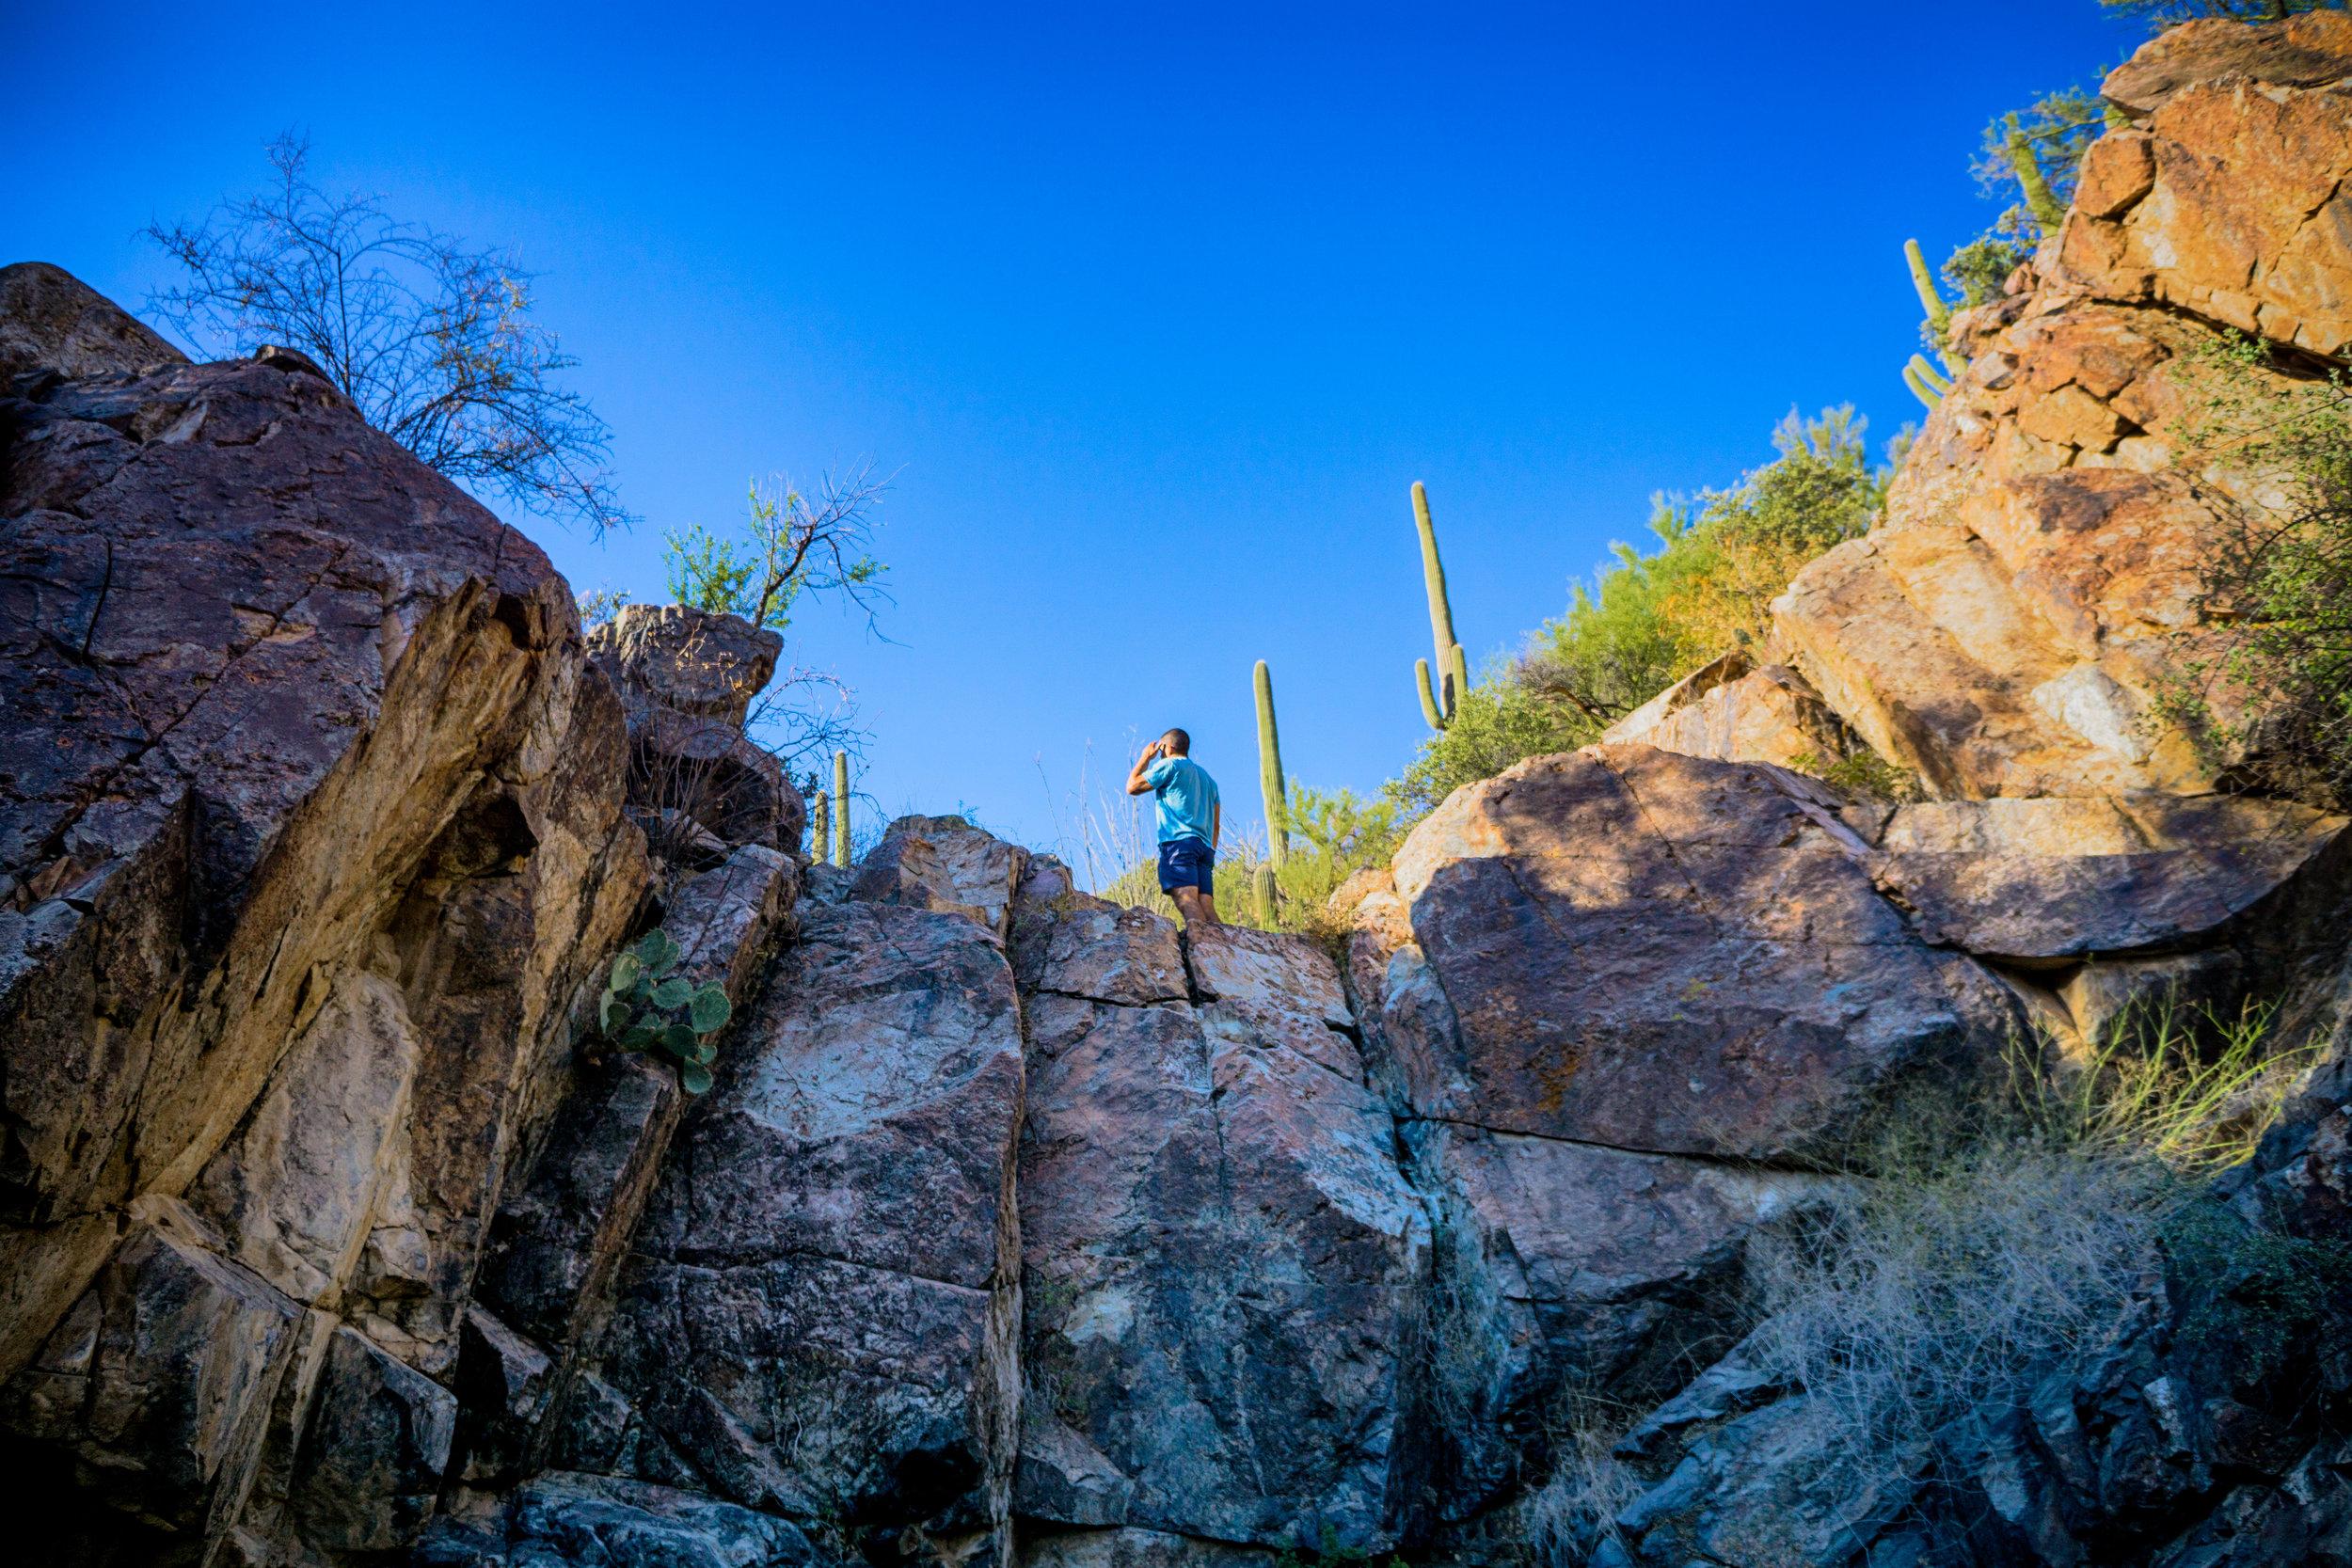 vickygood_photography_nature_saguaro-park6.jpg